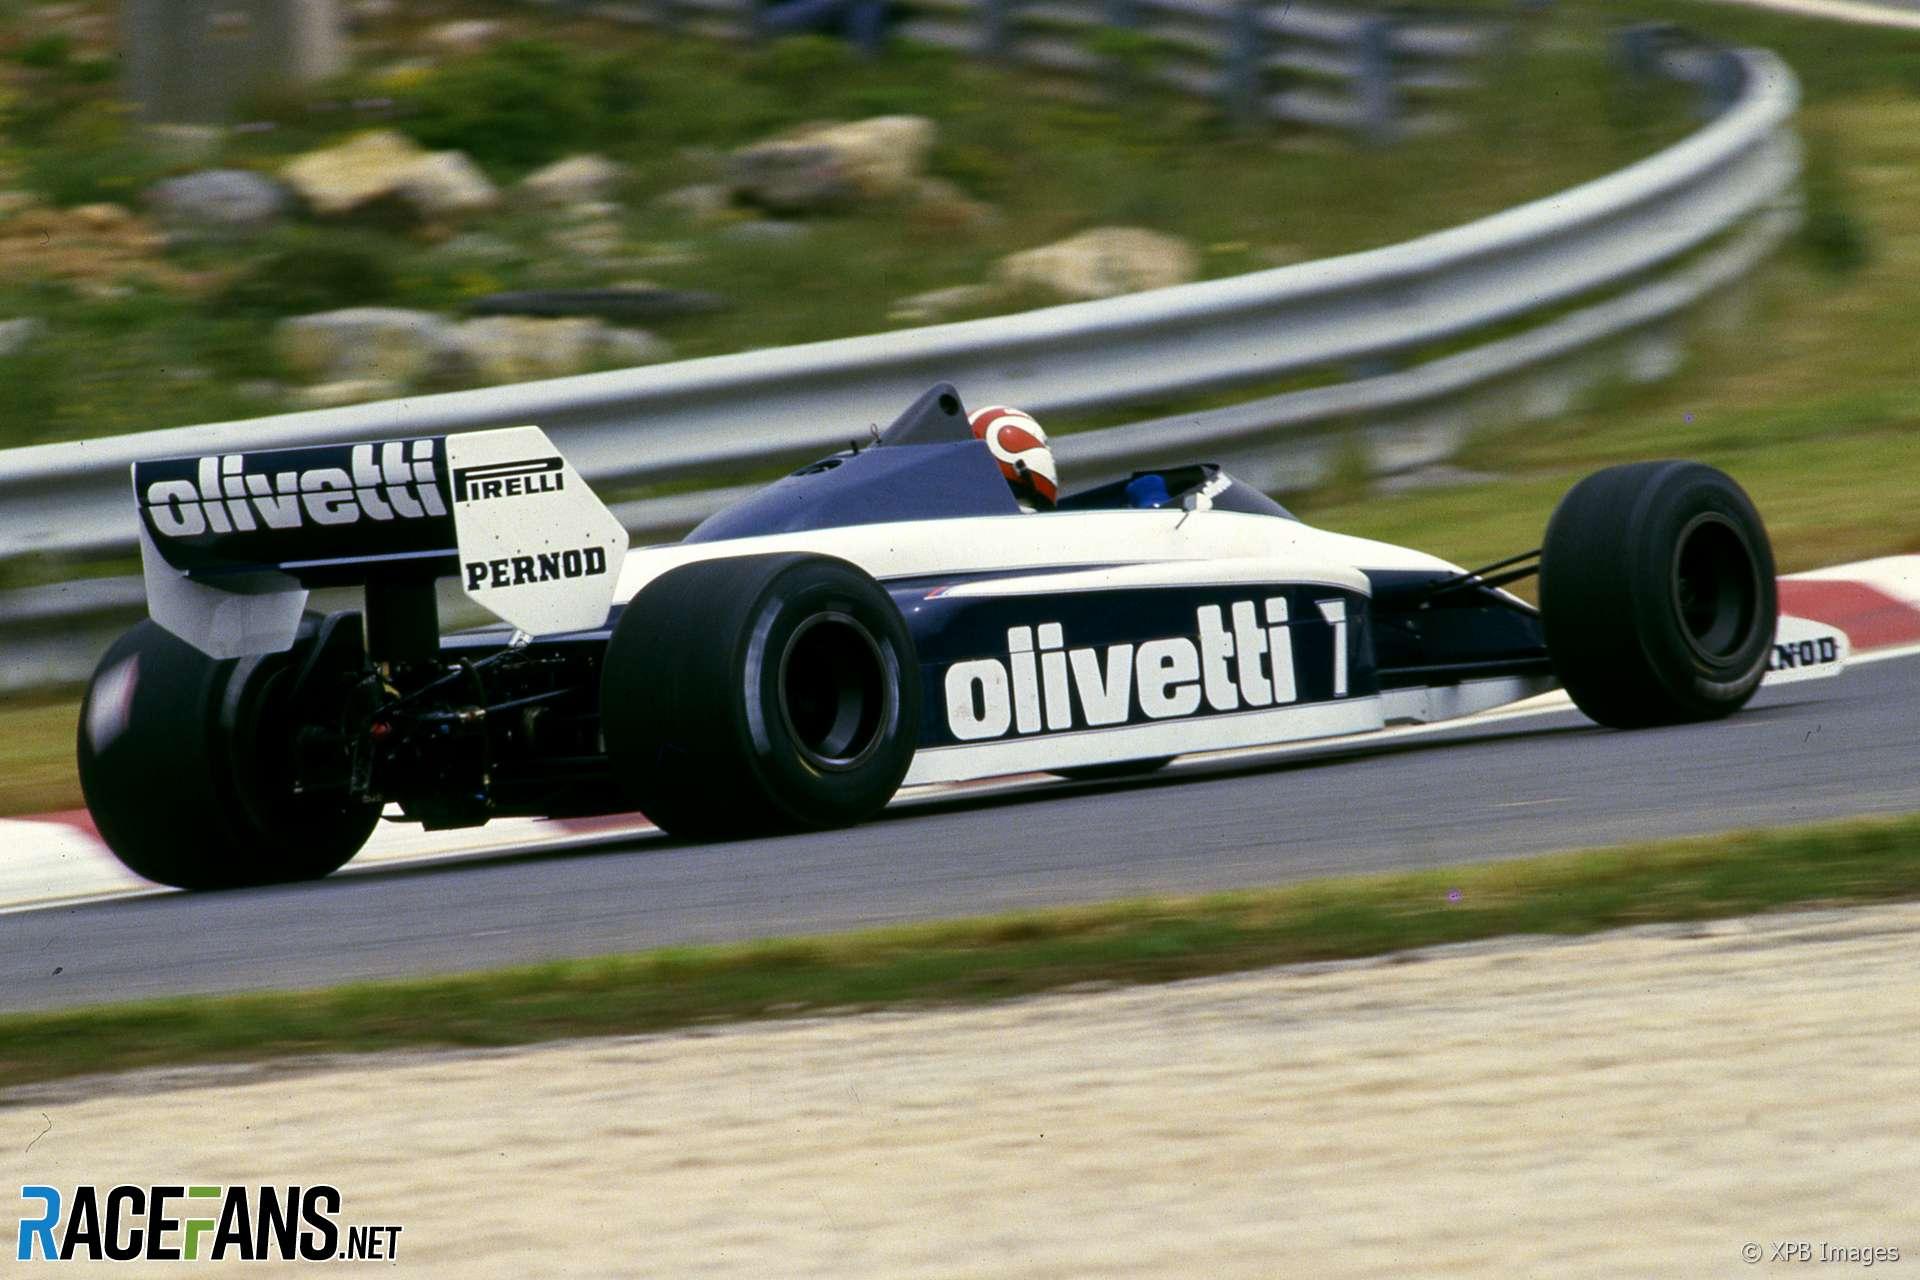 Nelson Piquet, Brabham, Estoril, 1985